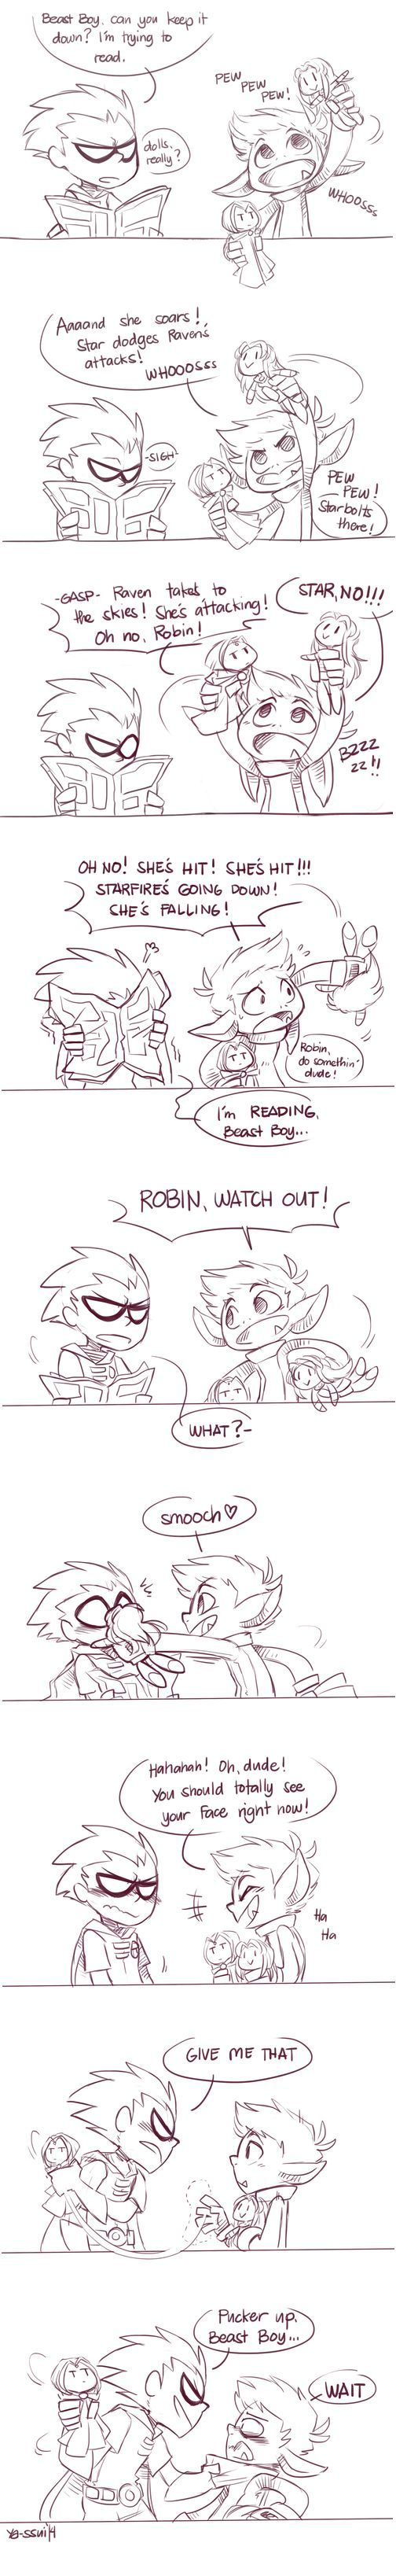 Beastboy & Robin, hanging around